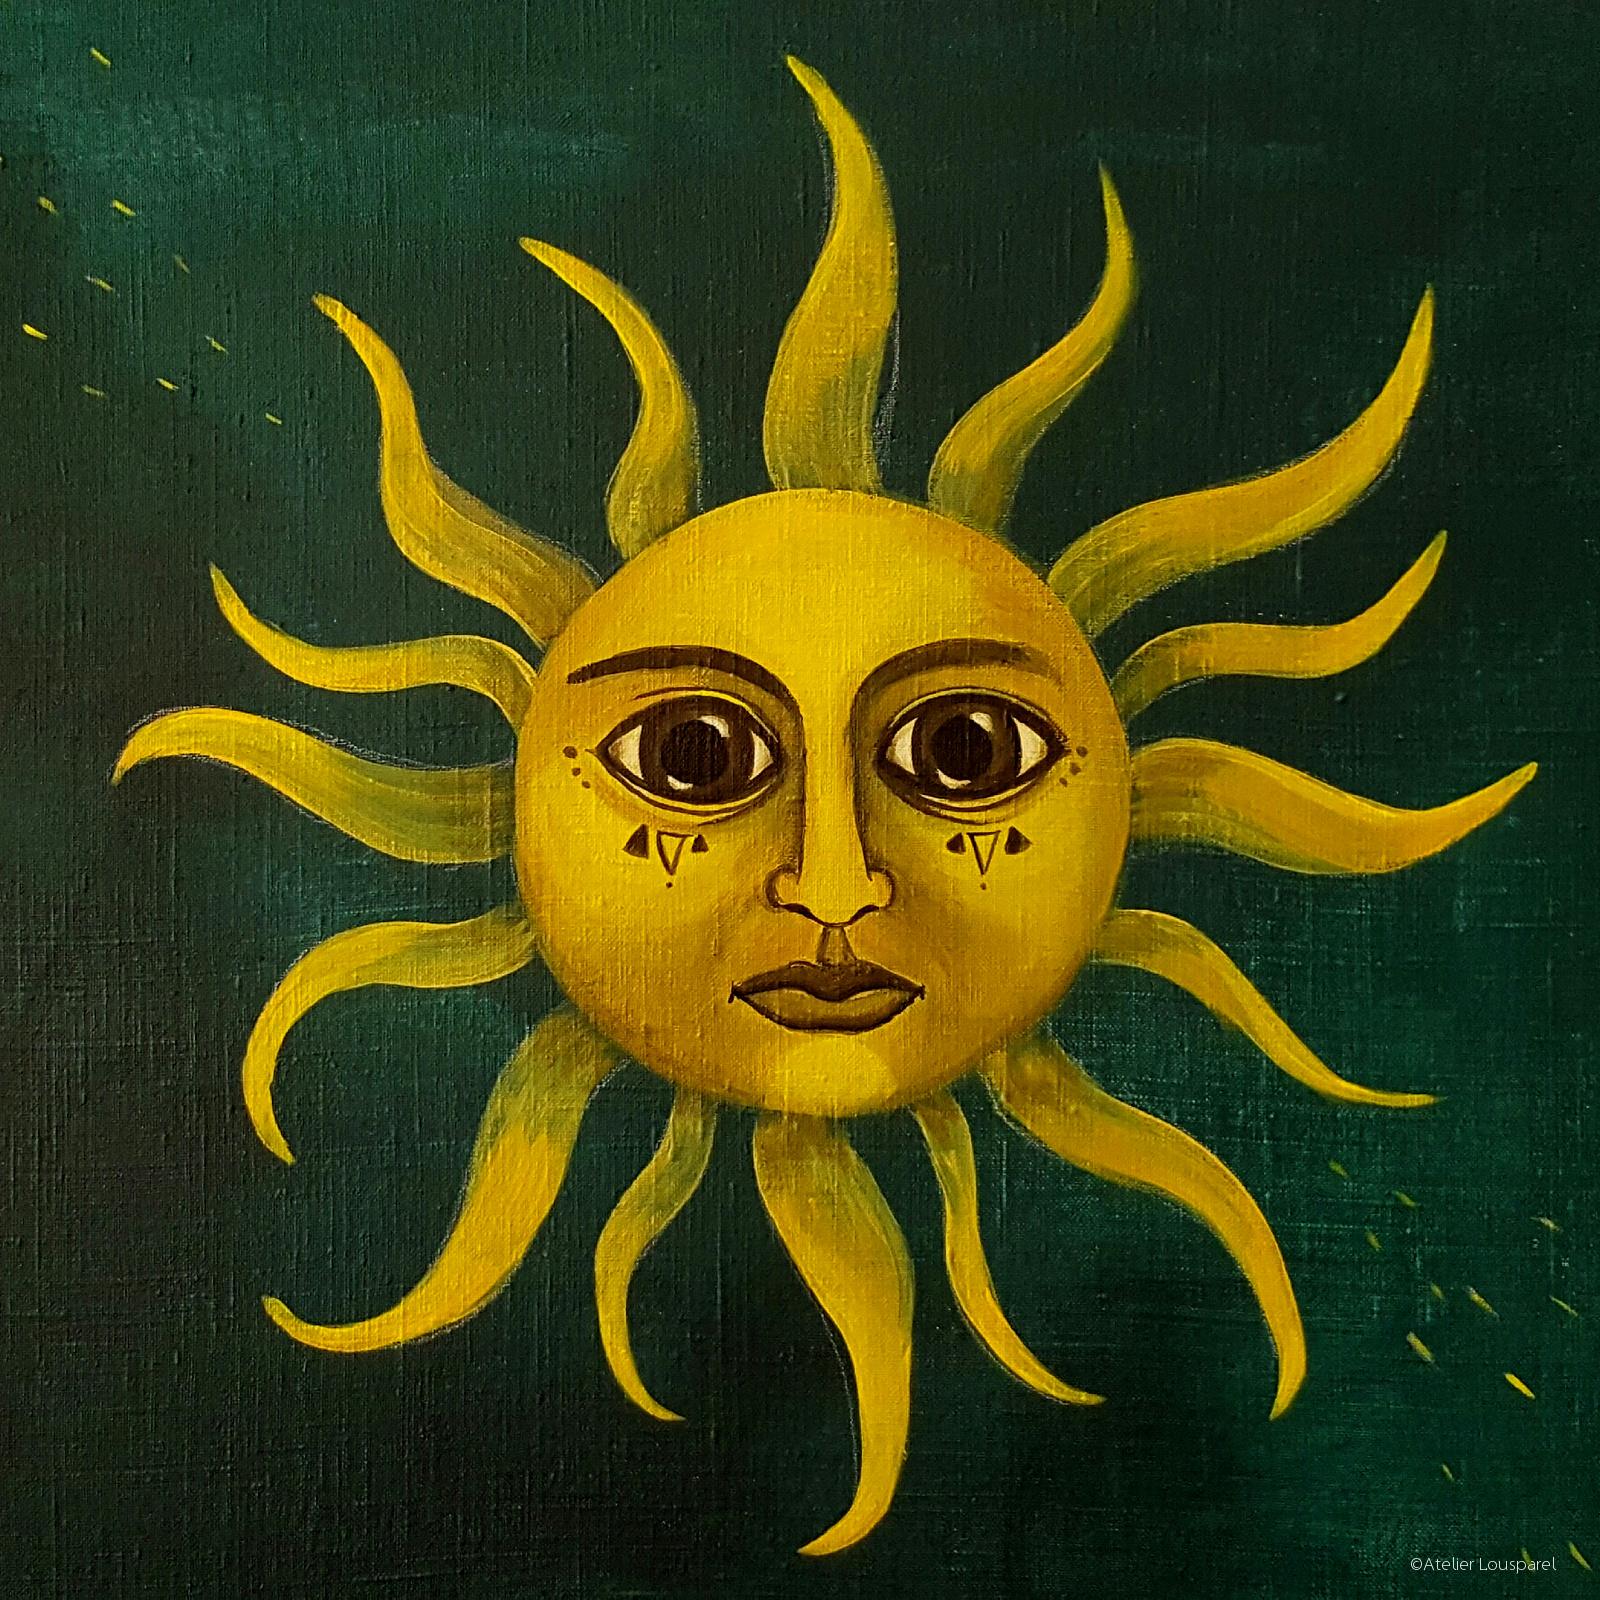 Soleil